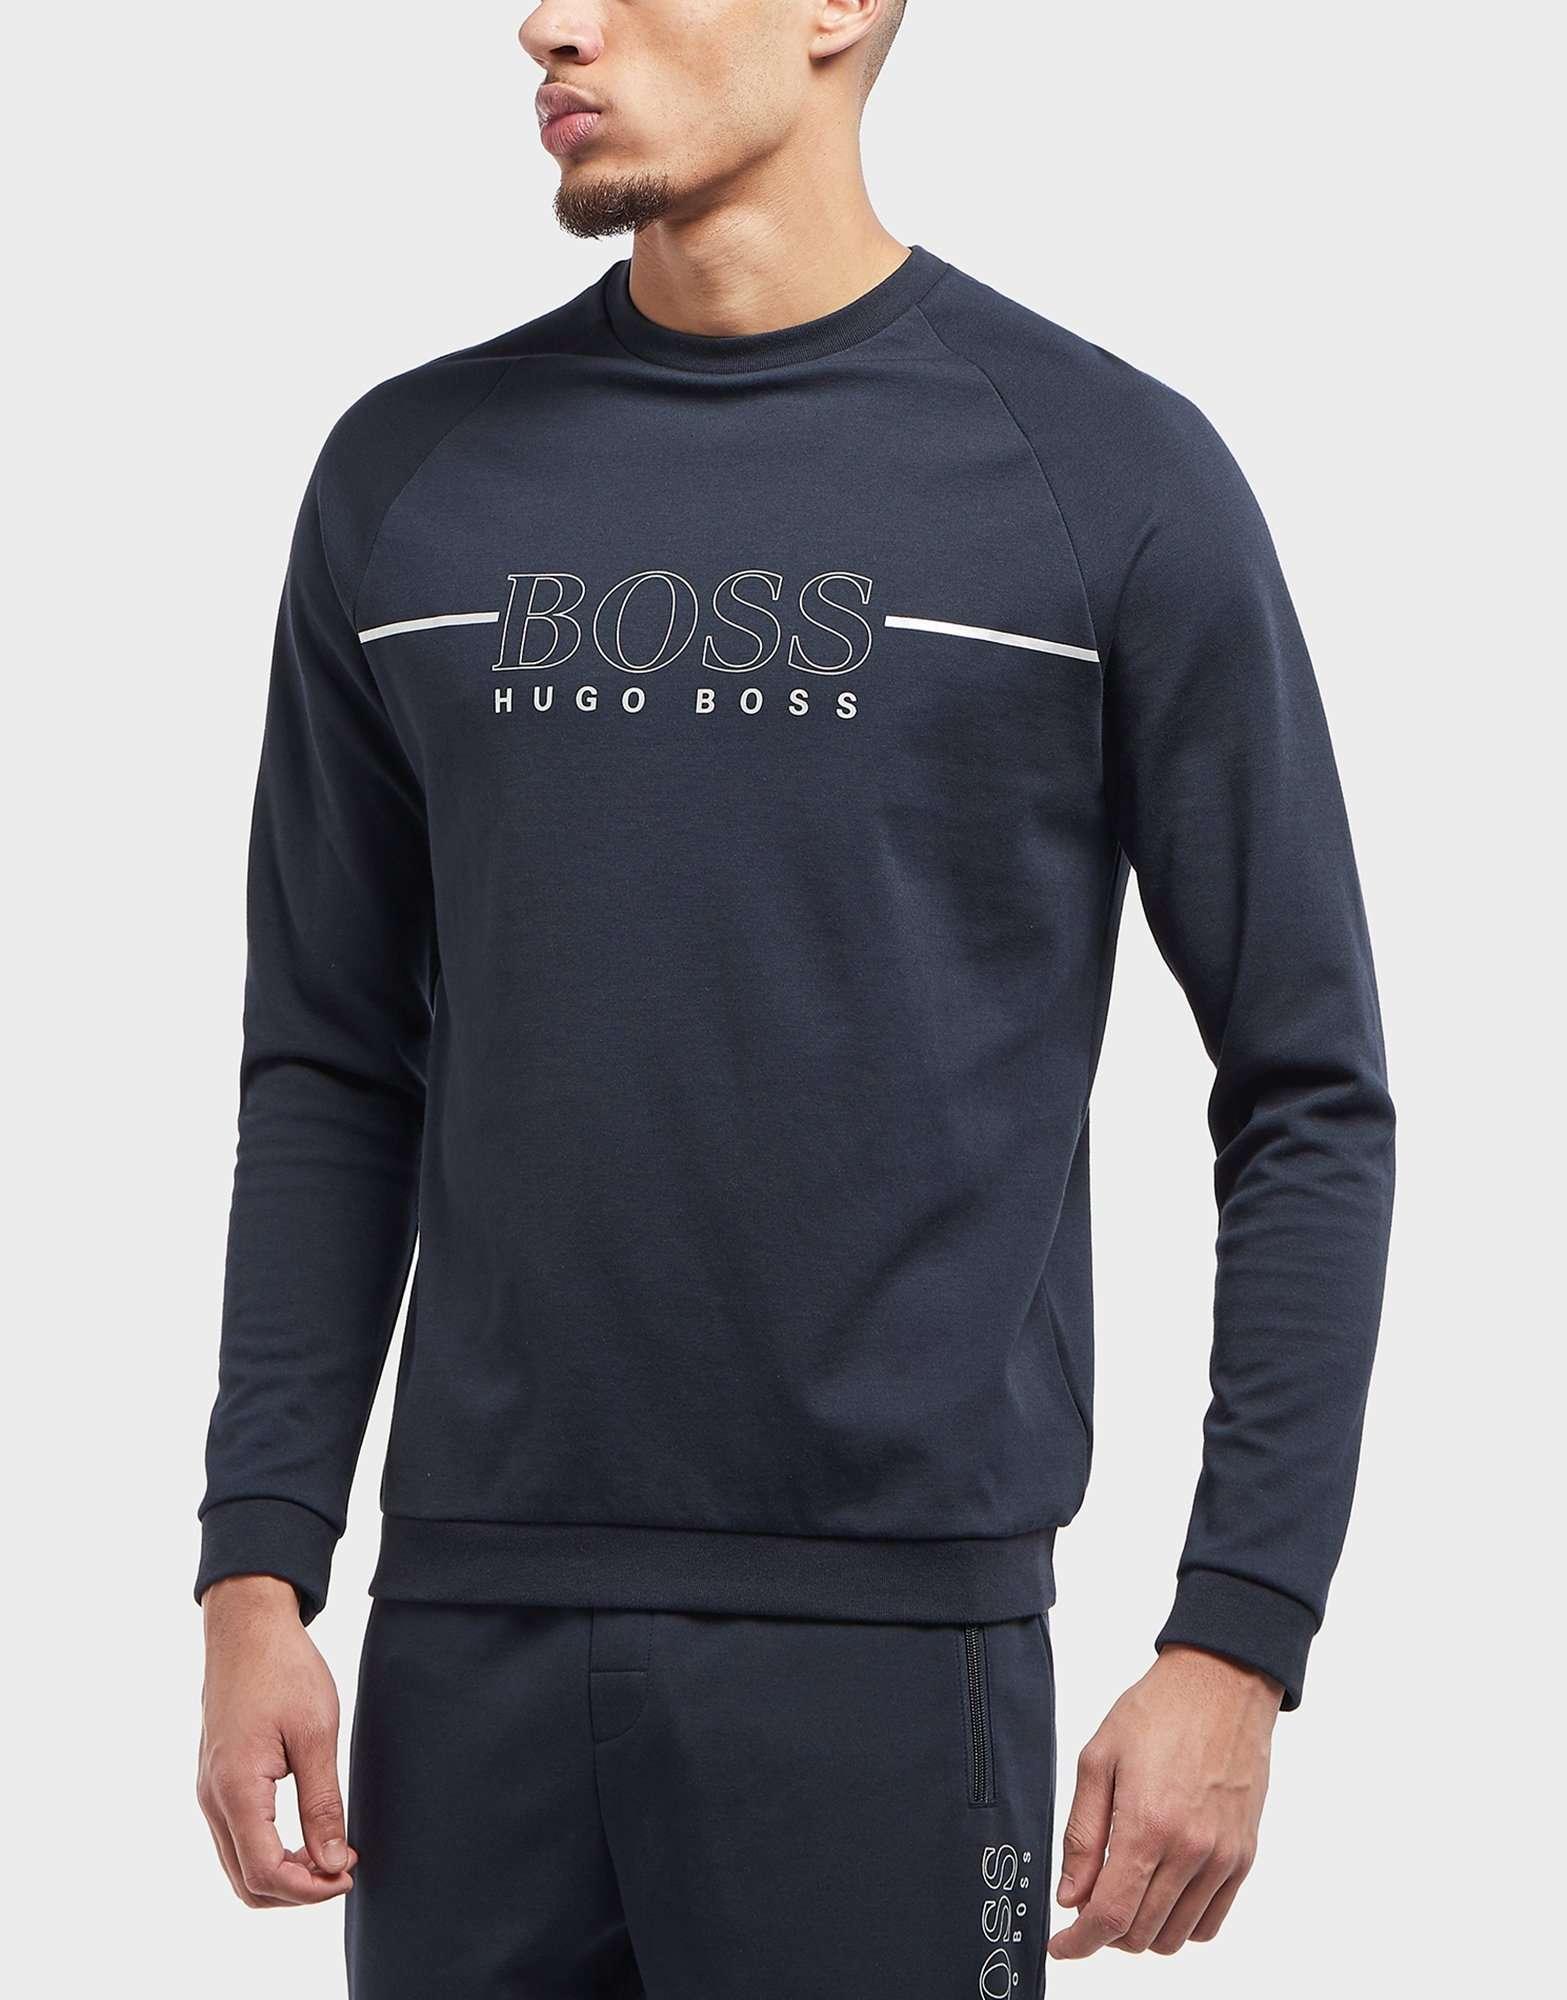 BOSS Foil Fleece Crew Sweatshirt